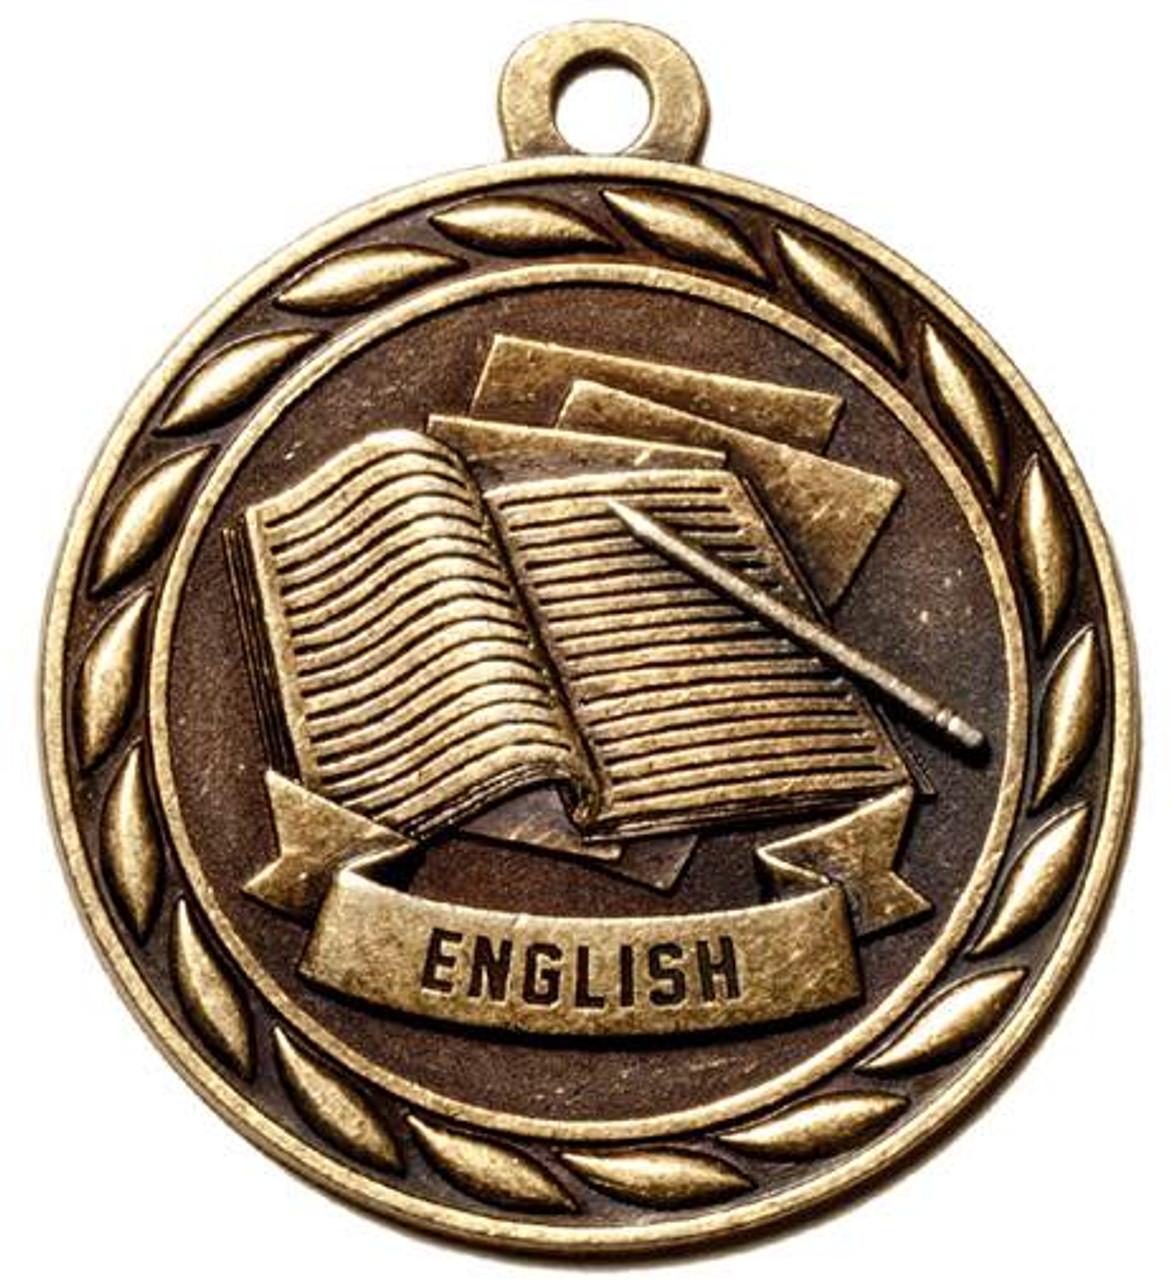 English Medal